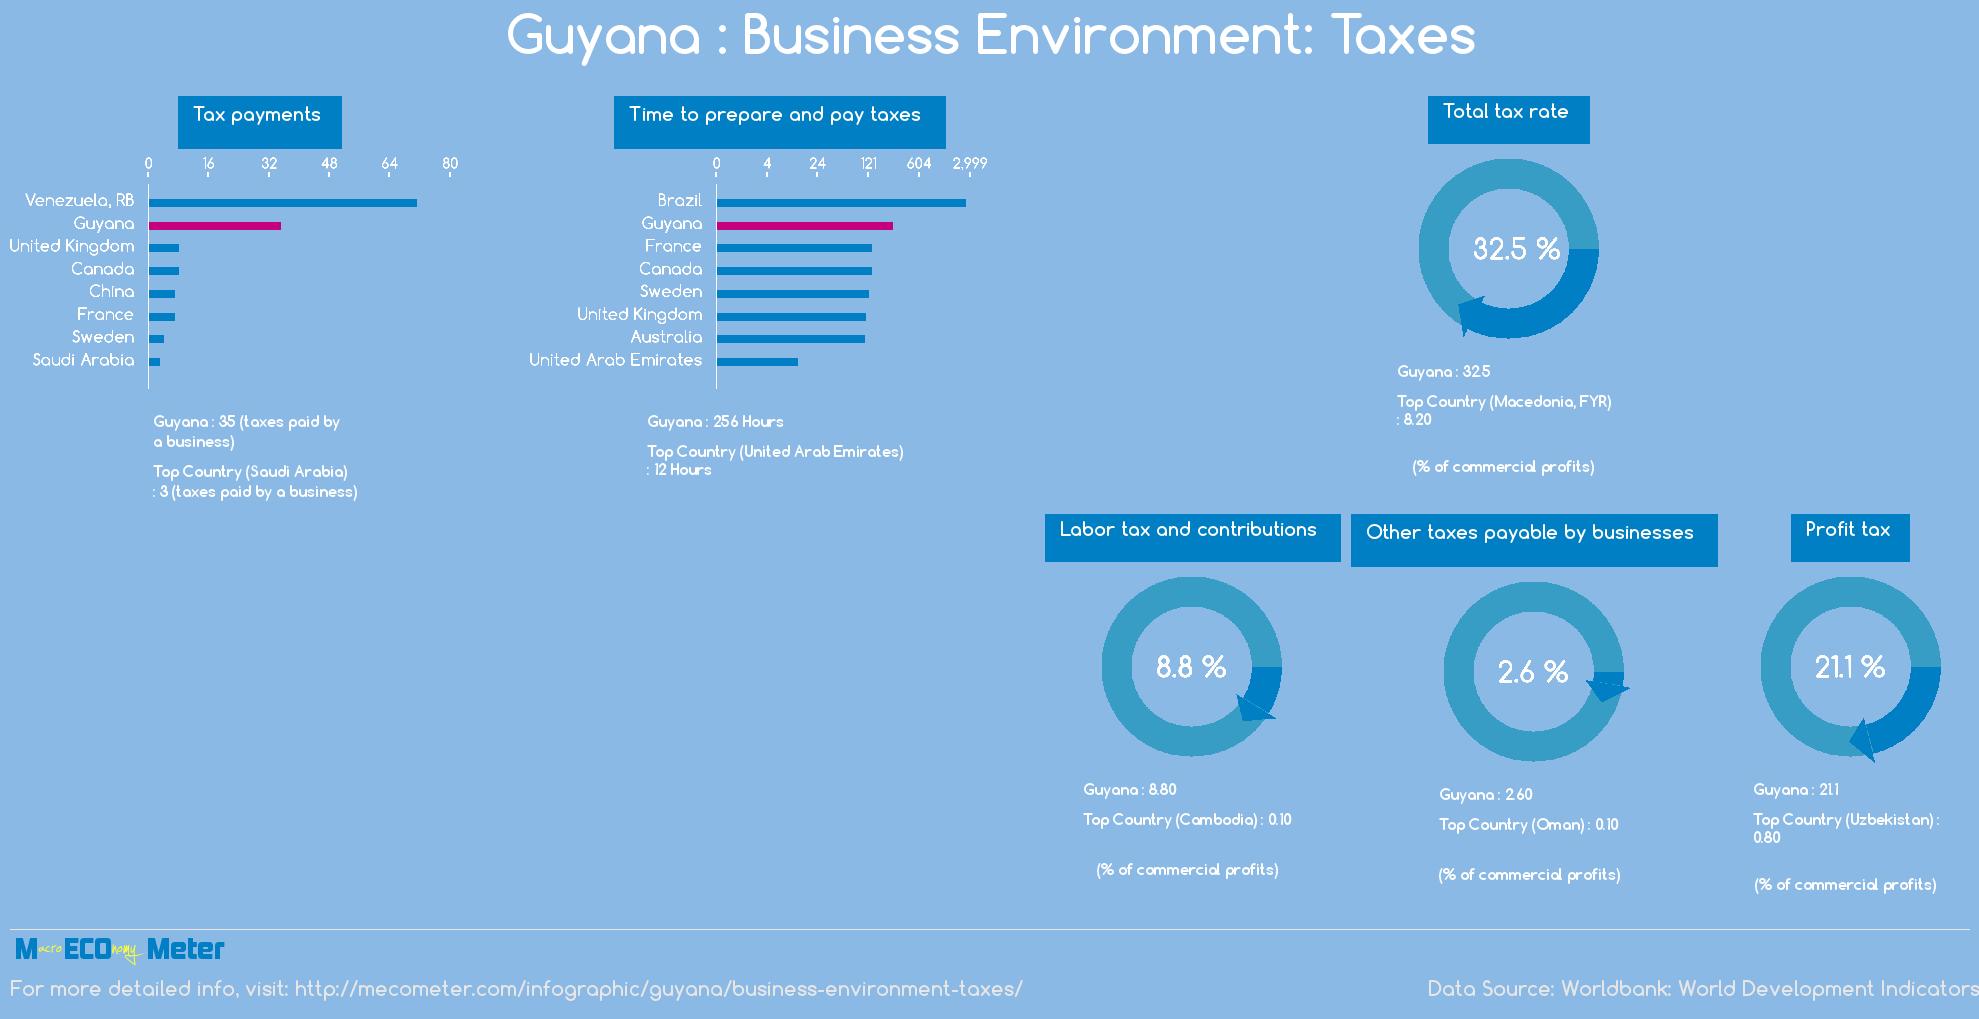 Guyana : Business Environment: Taxes